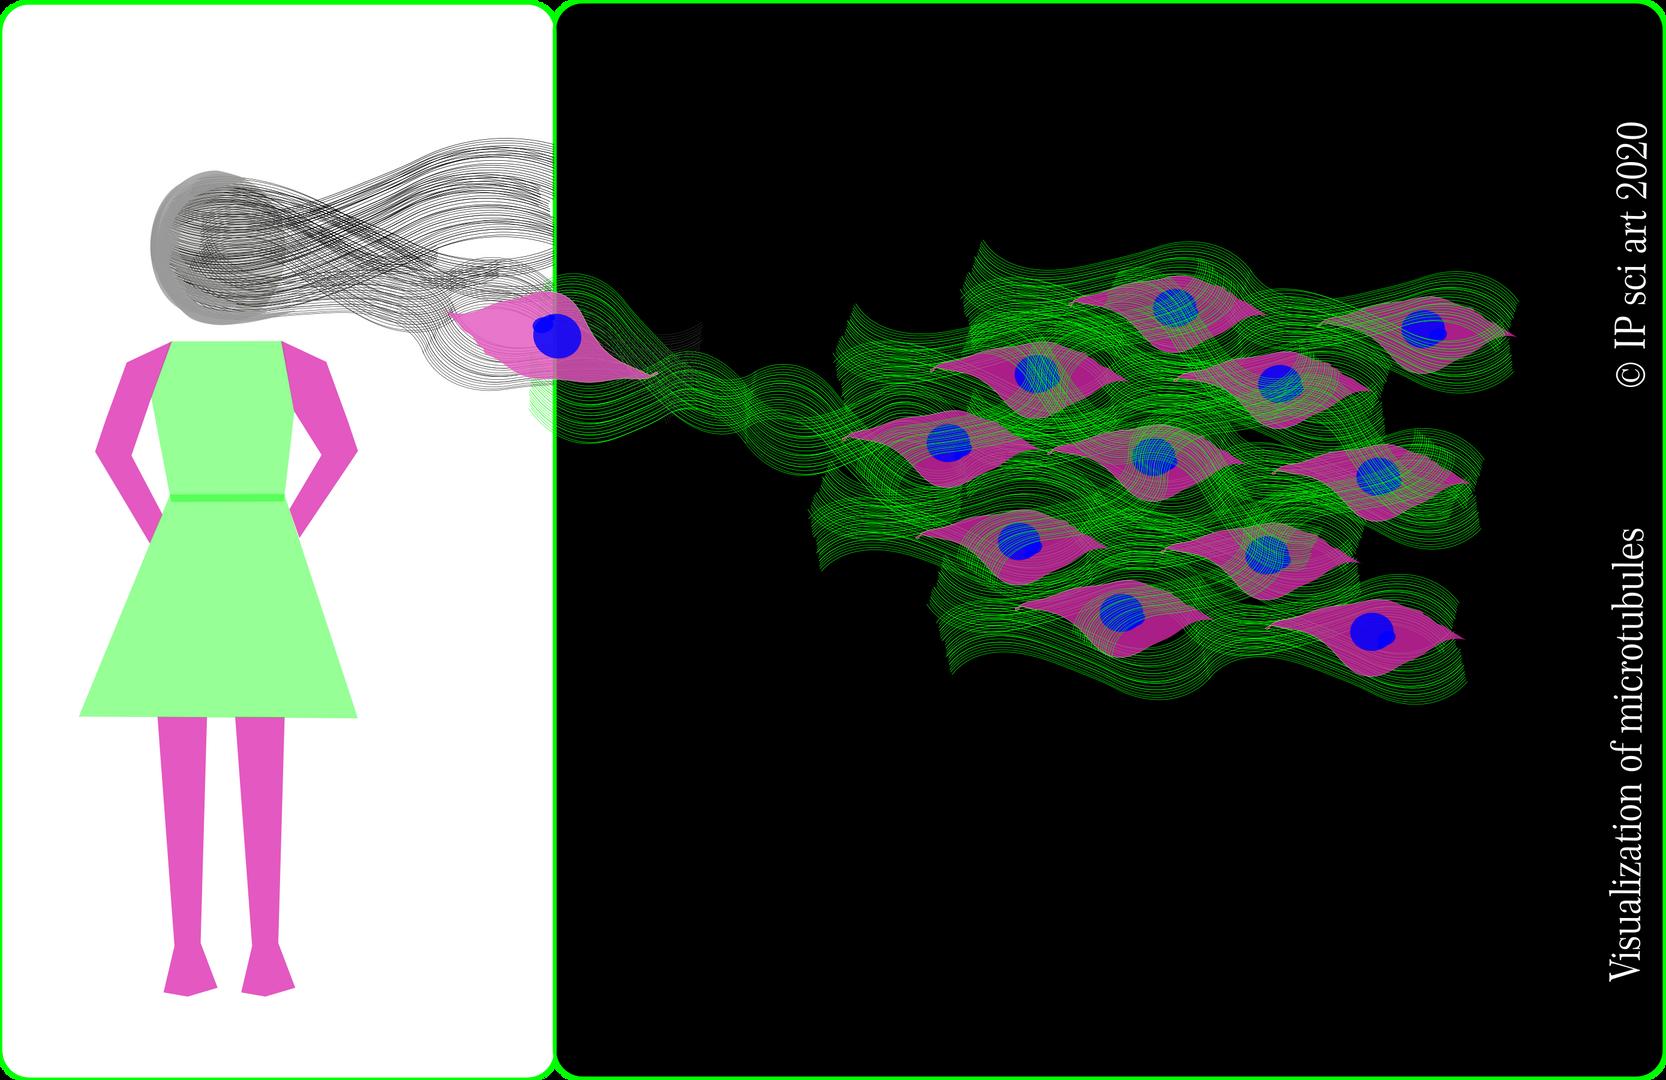 Visualization of microtubules